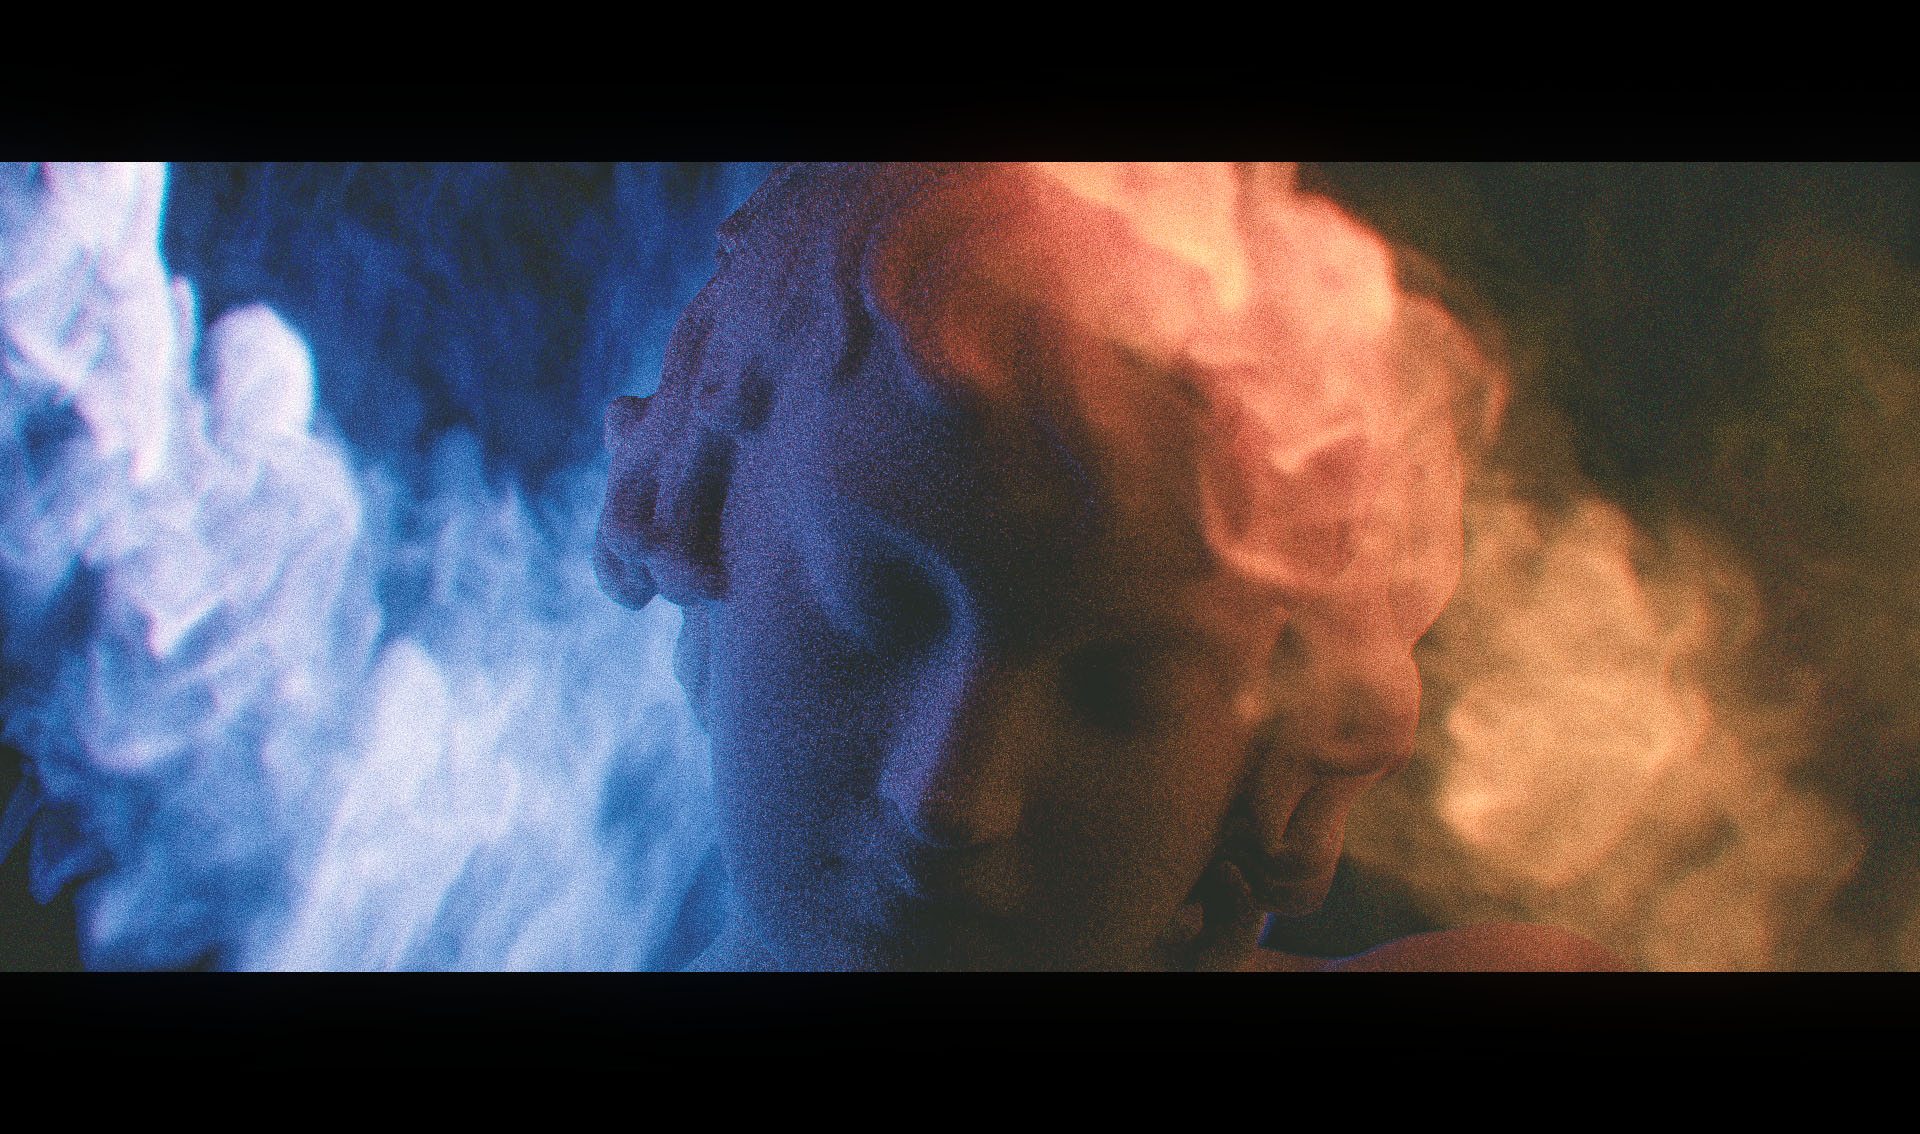 SmokeScene_A.jpg